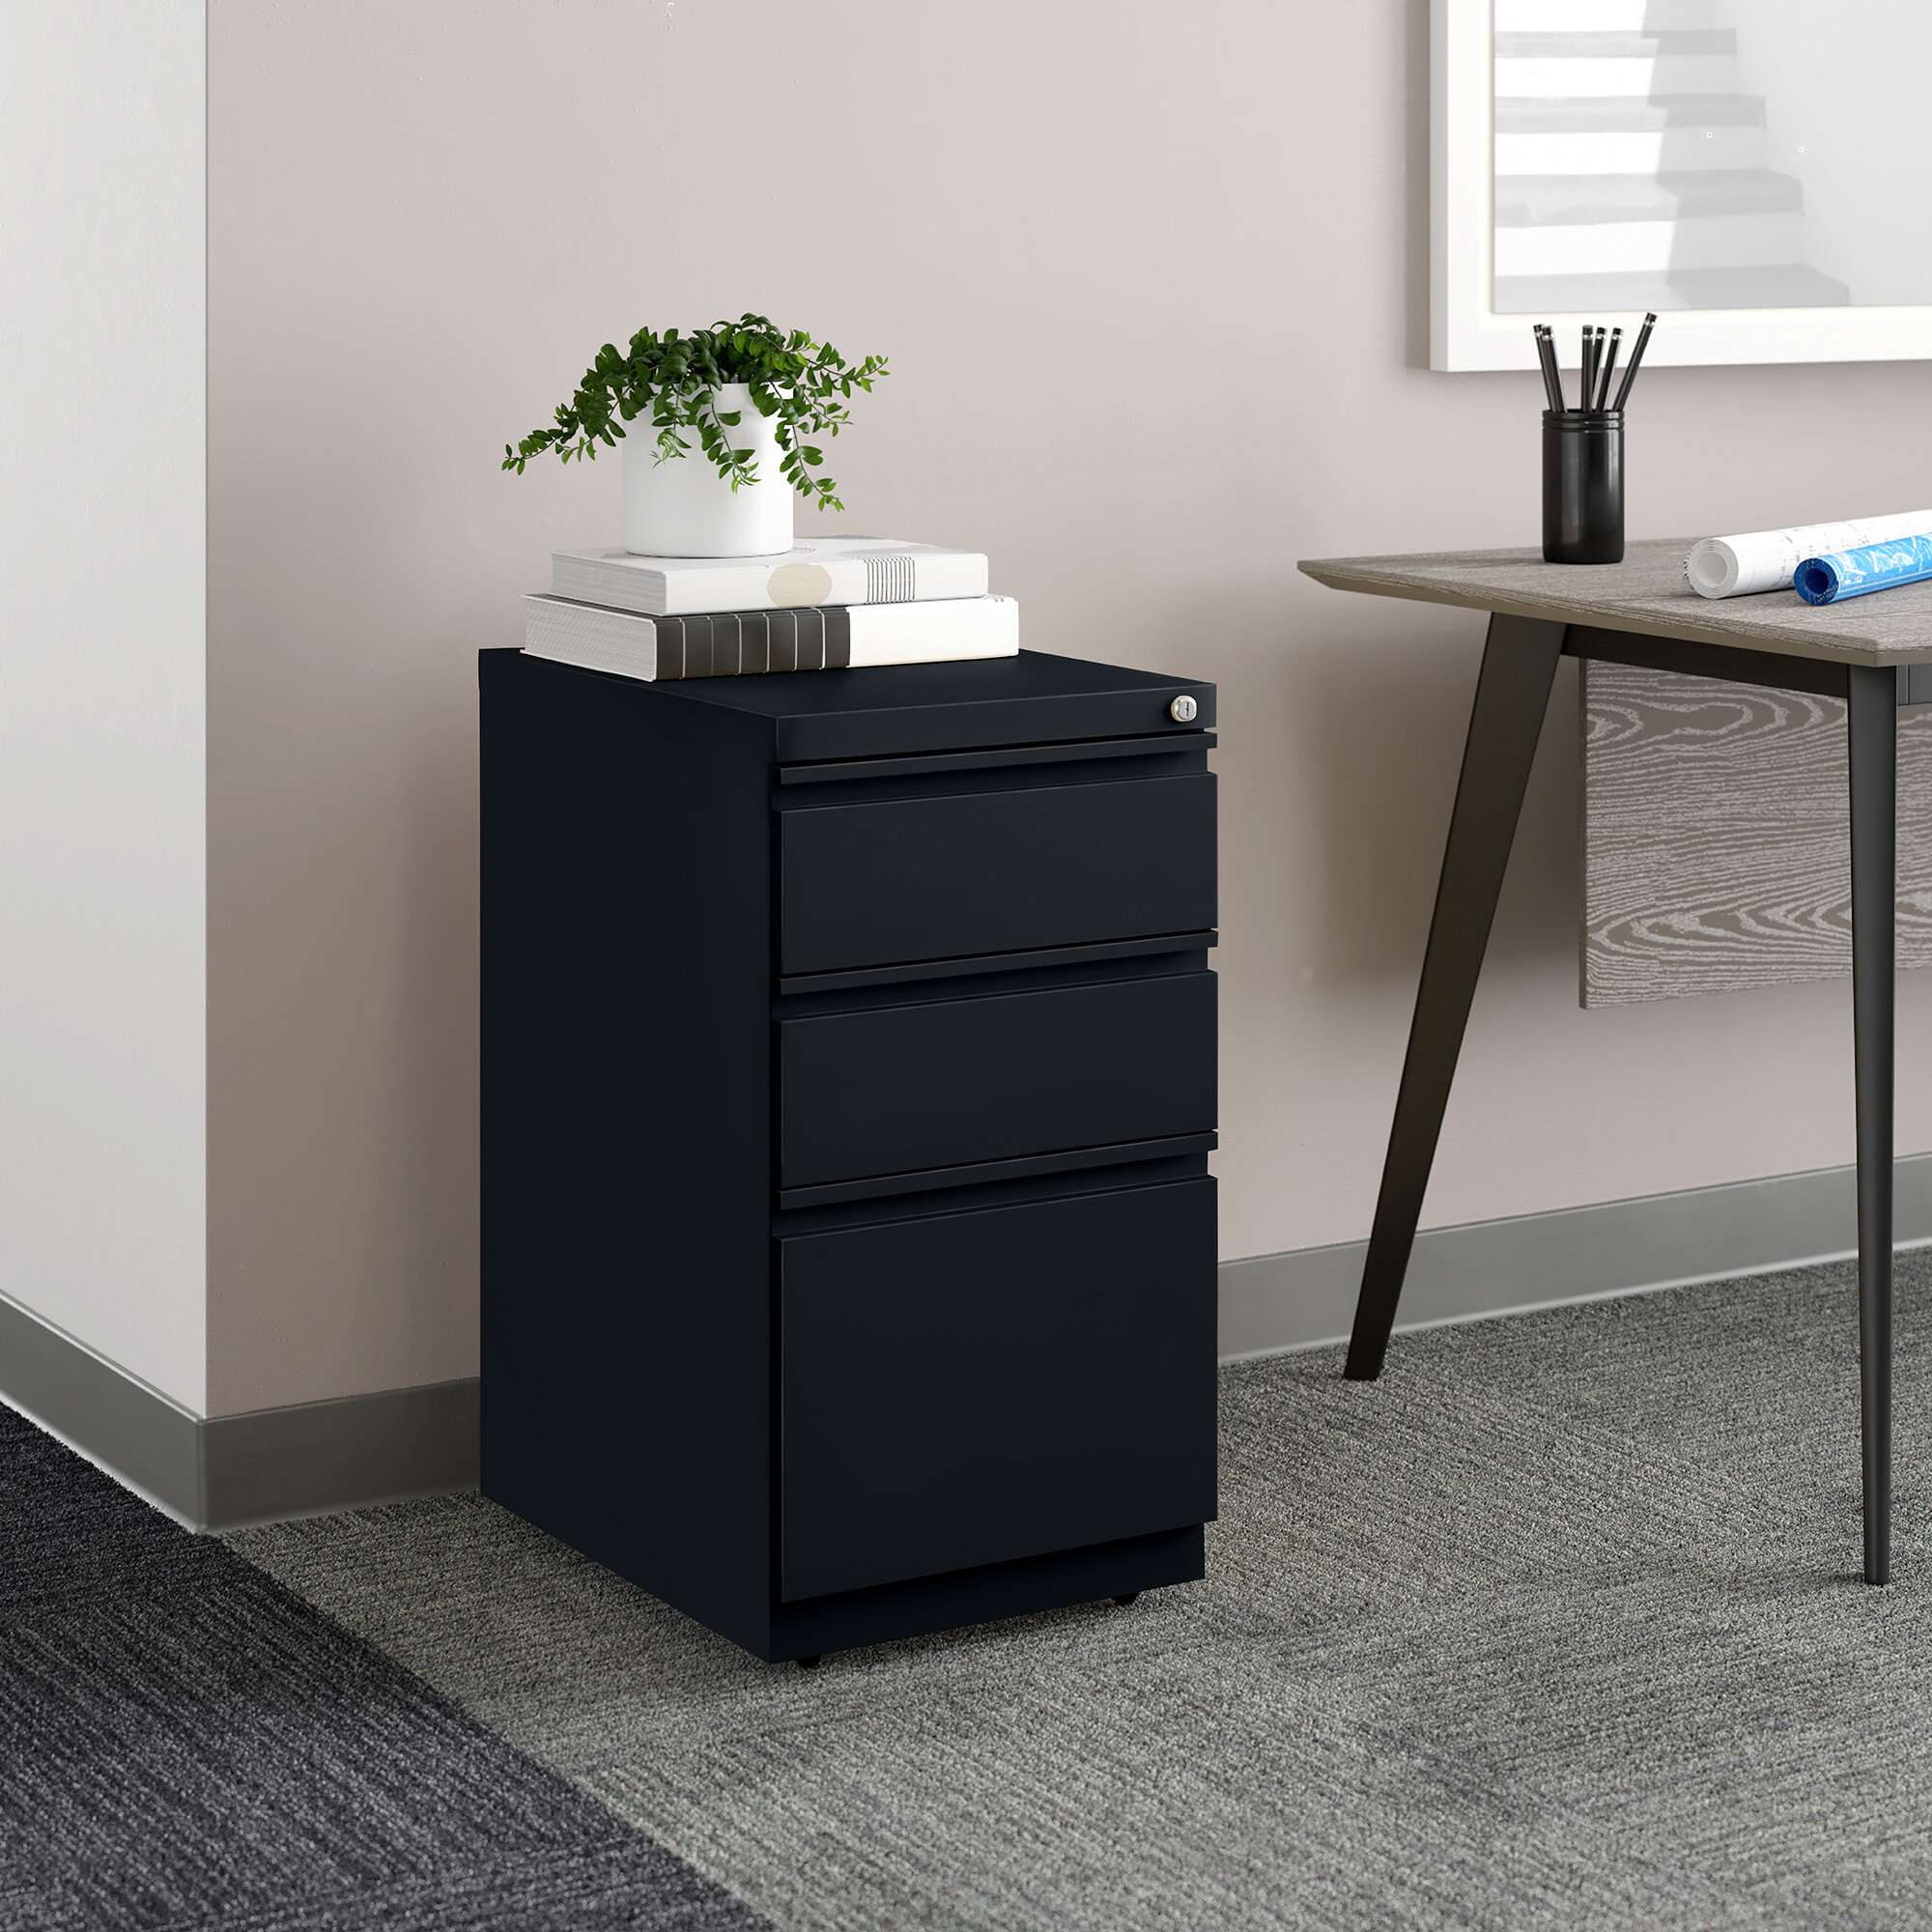 Upper Square Premo 3 Drawer Mobile Vertical Filing Cabinet Reviews Wayfair